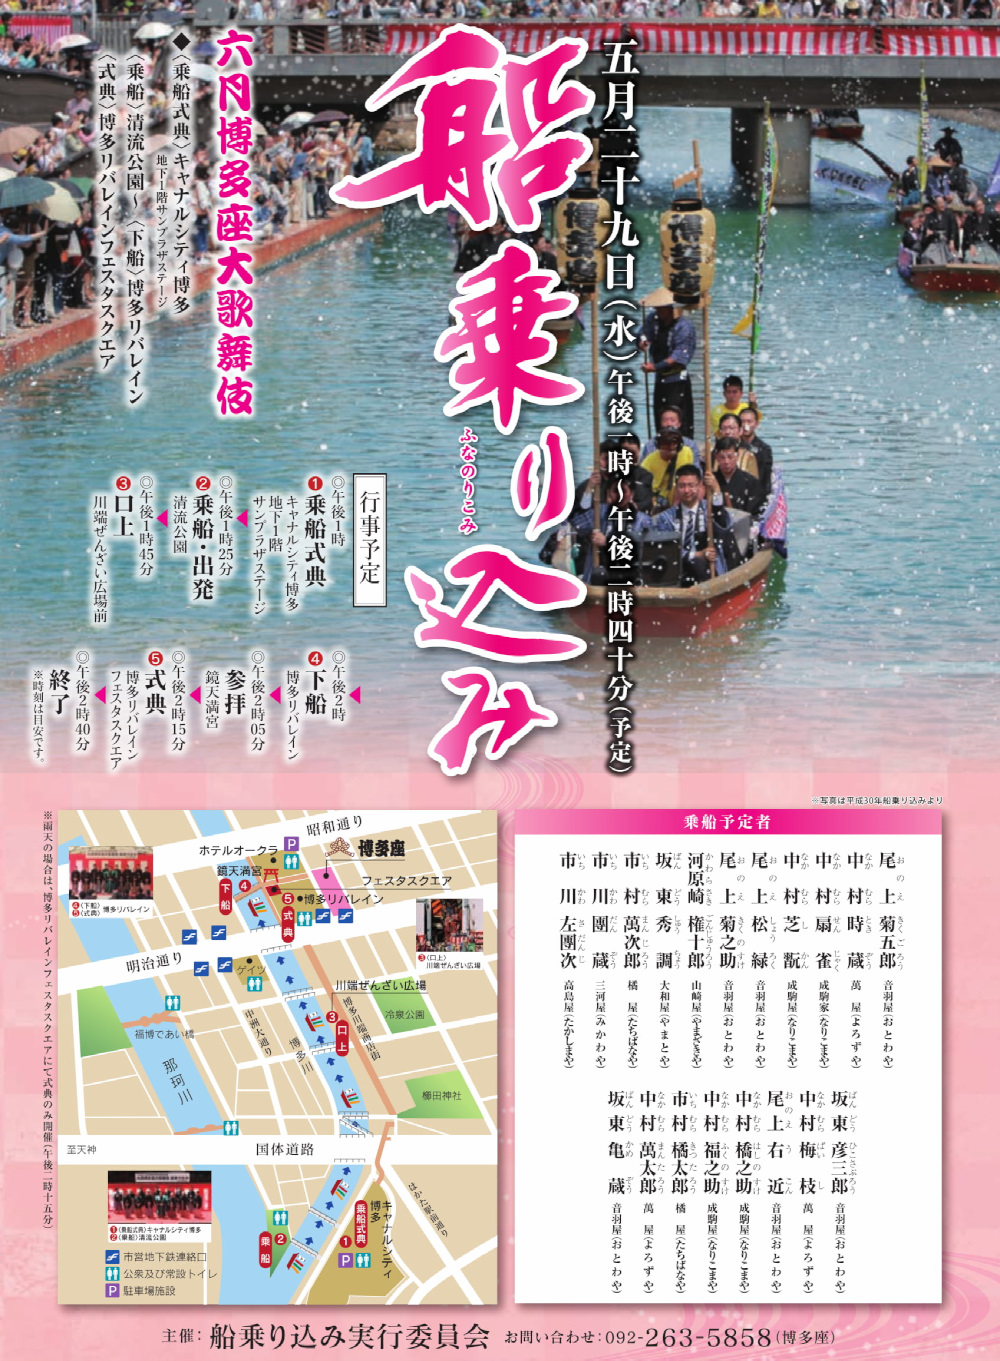 「六月博多座大歌舞伎」船乗り込み